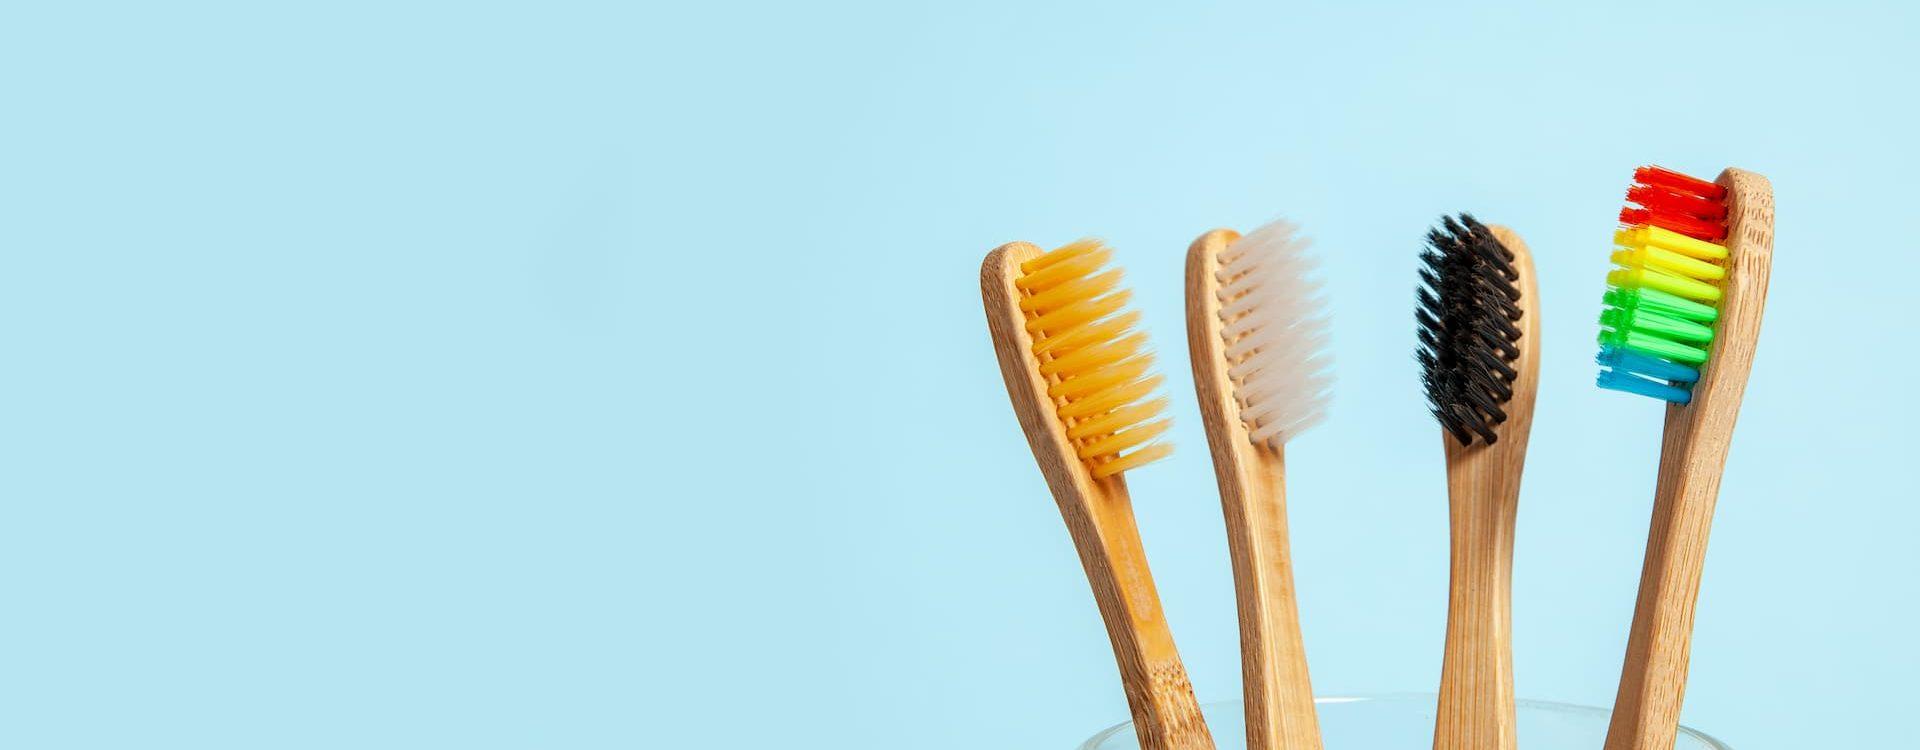 cepillado-dental